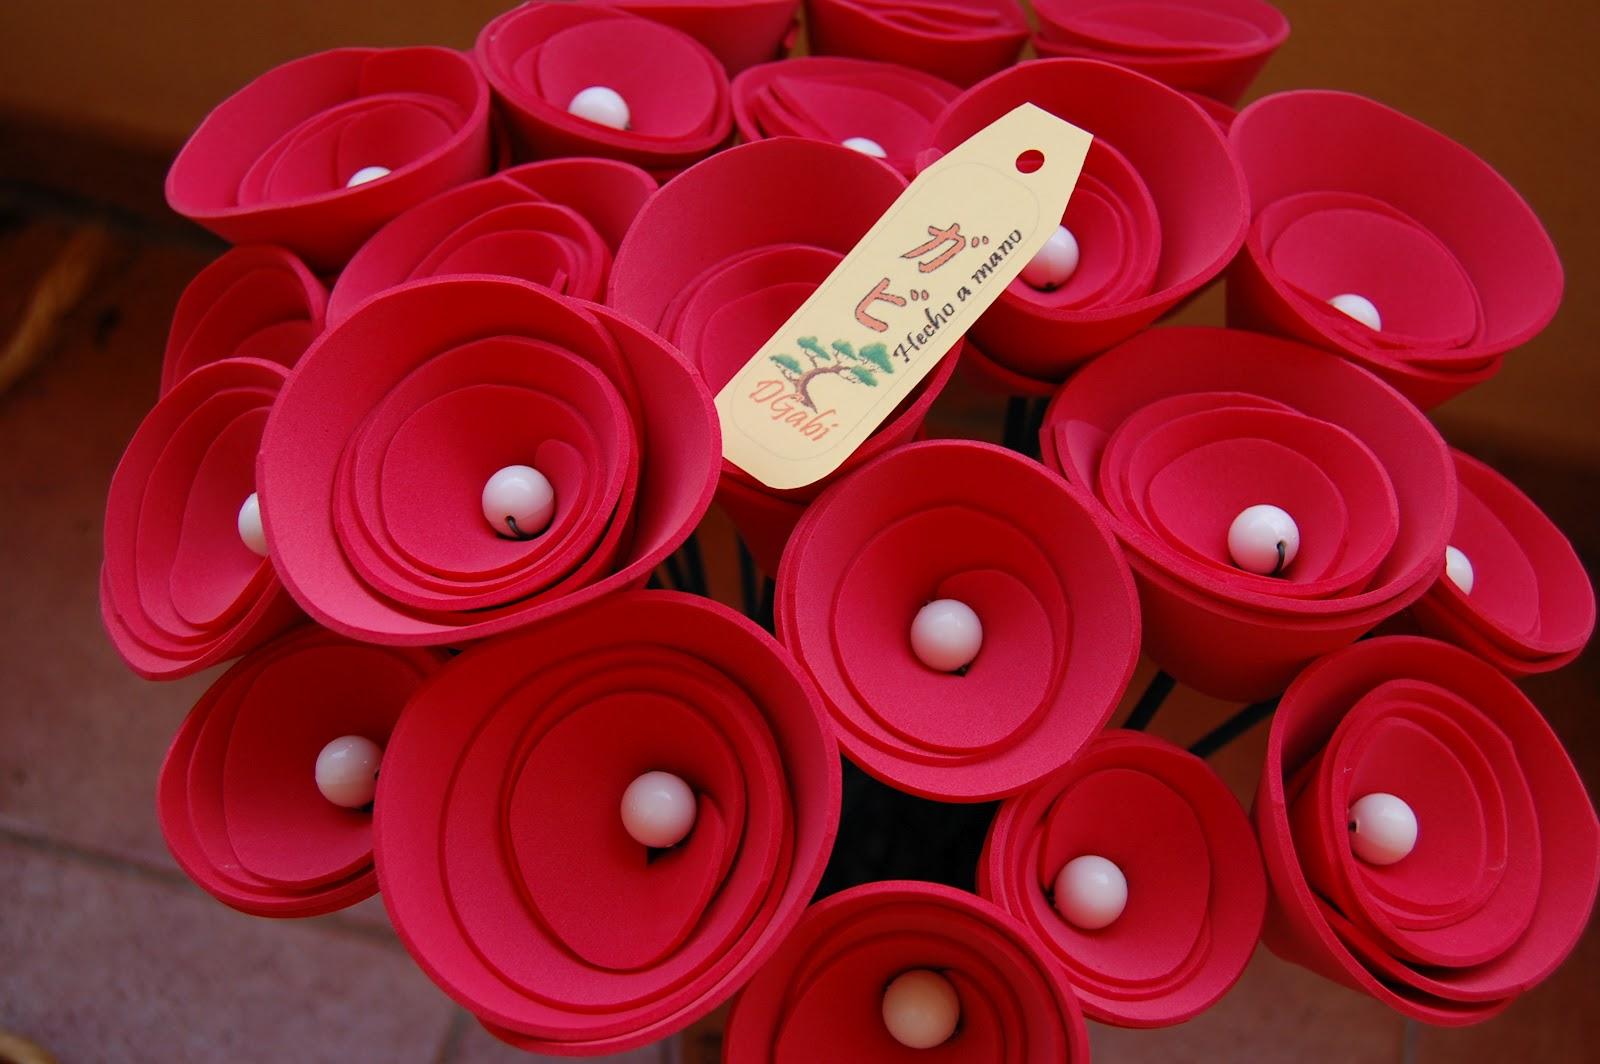 b6d848bd68f Los Detallitos DGabi  Ramo de flores de goma Eva